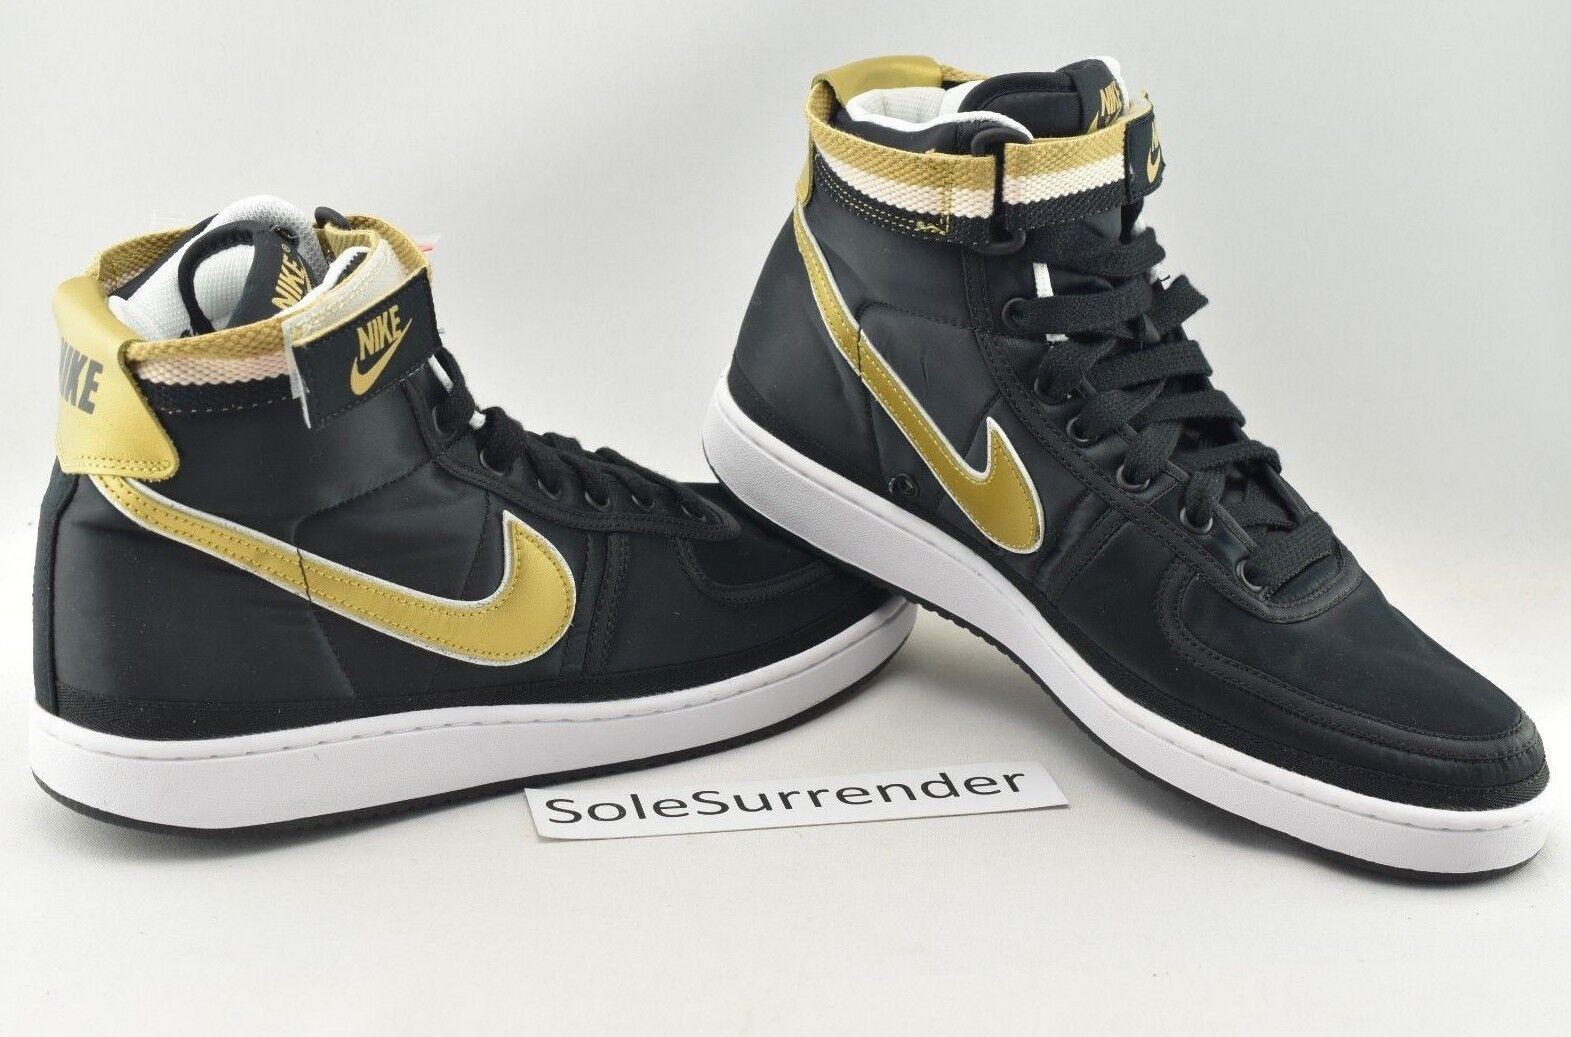 Nike Vandal High Supreme QS - SIZE 11 - AH8652-002 Black White Metallic gold OG